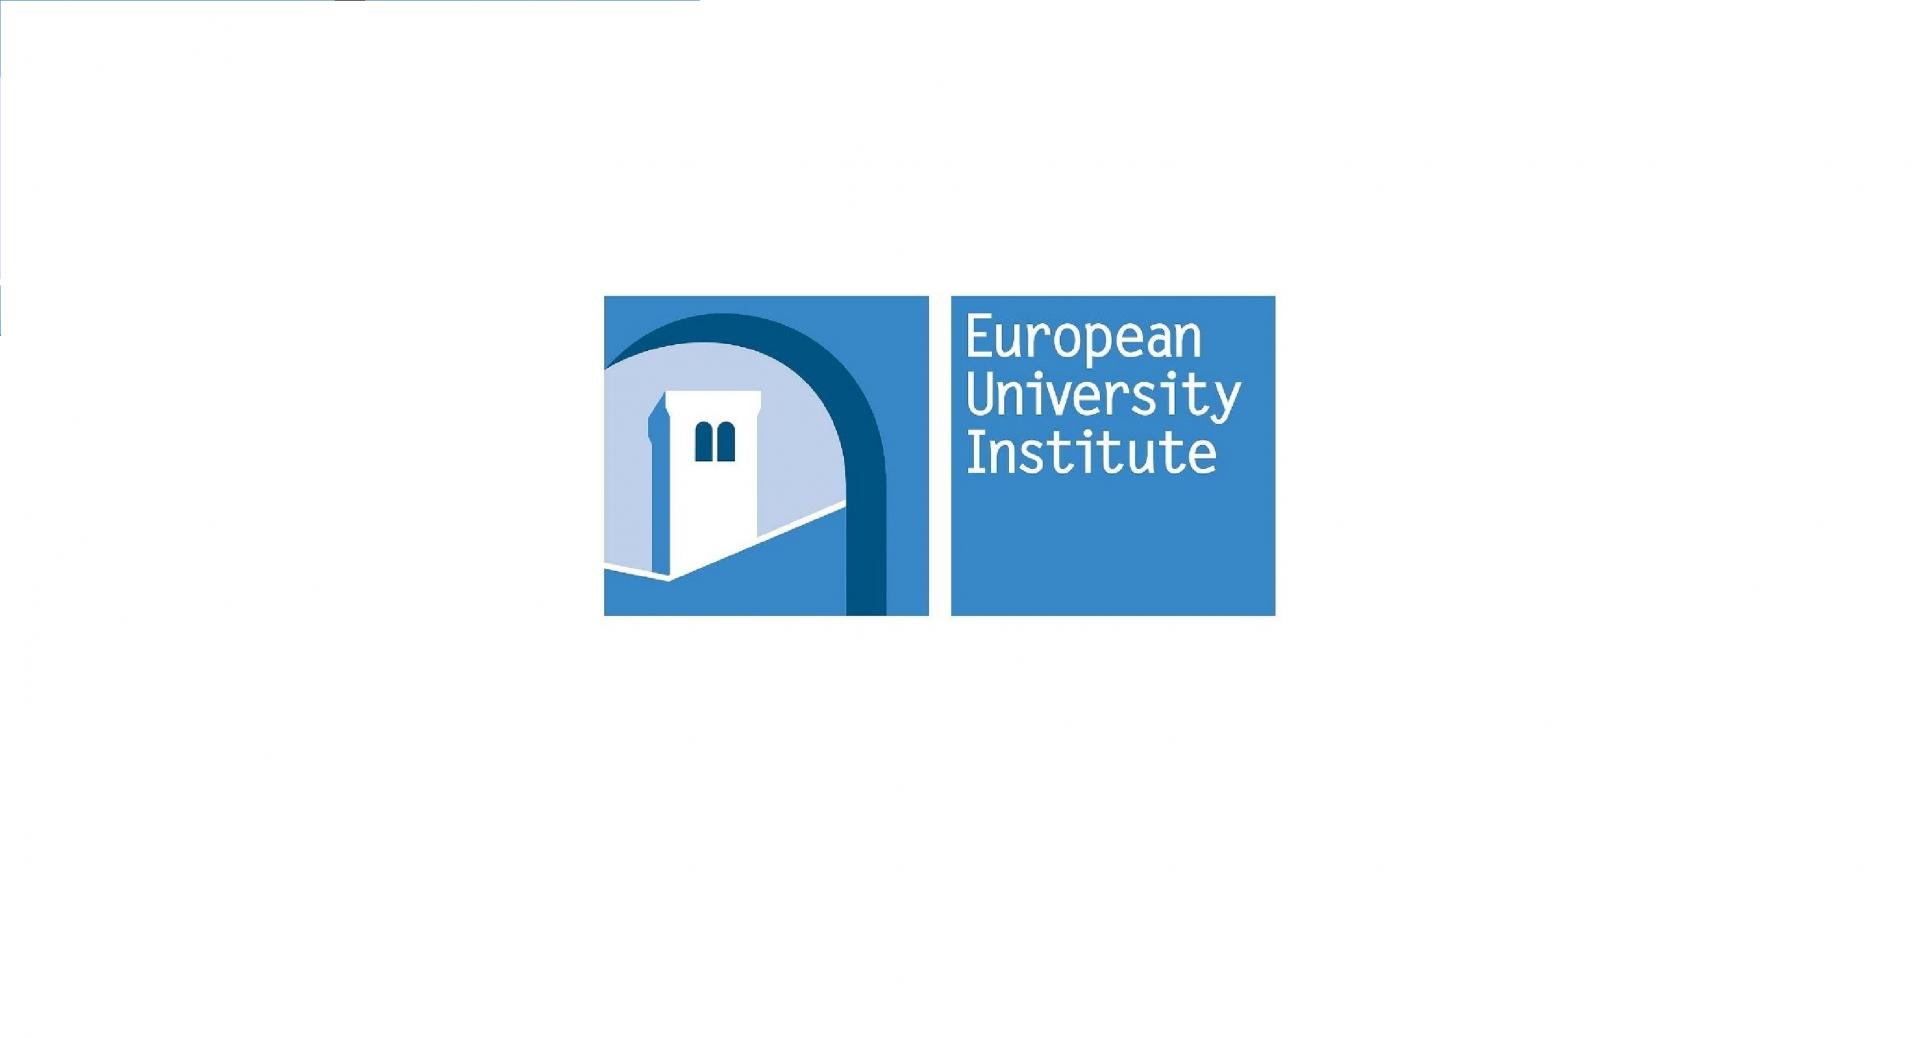 ITALY – EUROPEAN UNIVERSITY INSTITUTE – Enrique BARÓN CRESPO and Monica BALDI